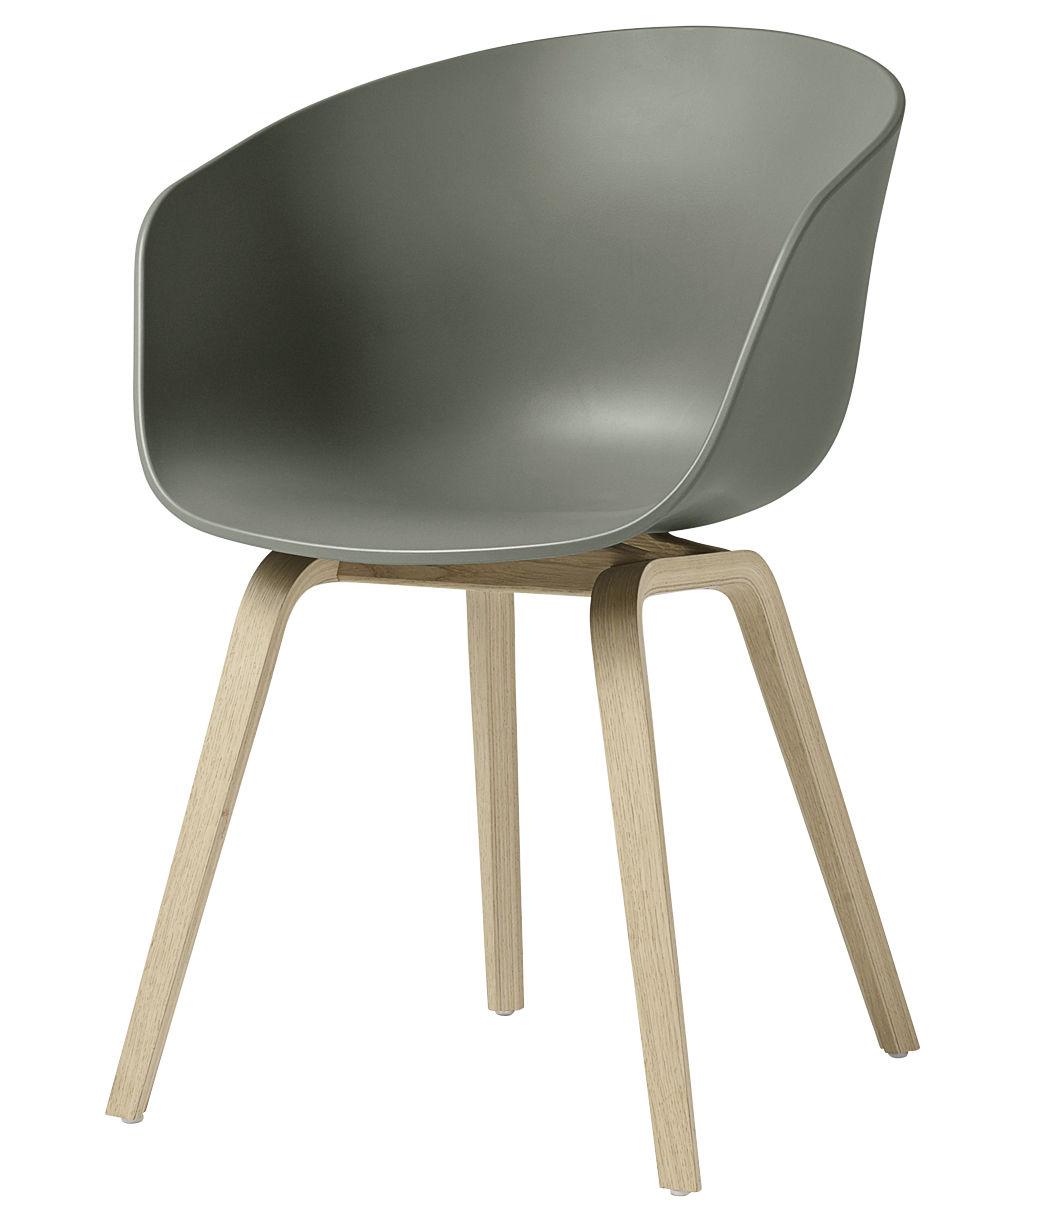 Arredamento - Sedie  - Poltrona About a chair AAC22 / Plastica & gambe legno - Hay - Verde kaki / Gambe legno naturale - Chêne verni mat, Polipropilene